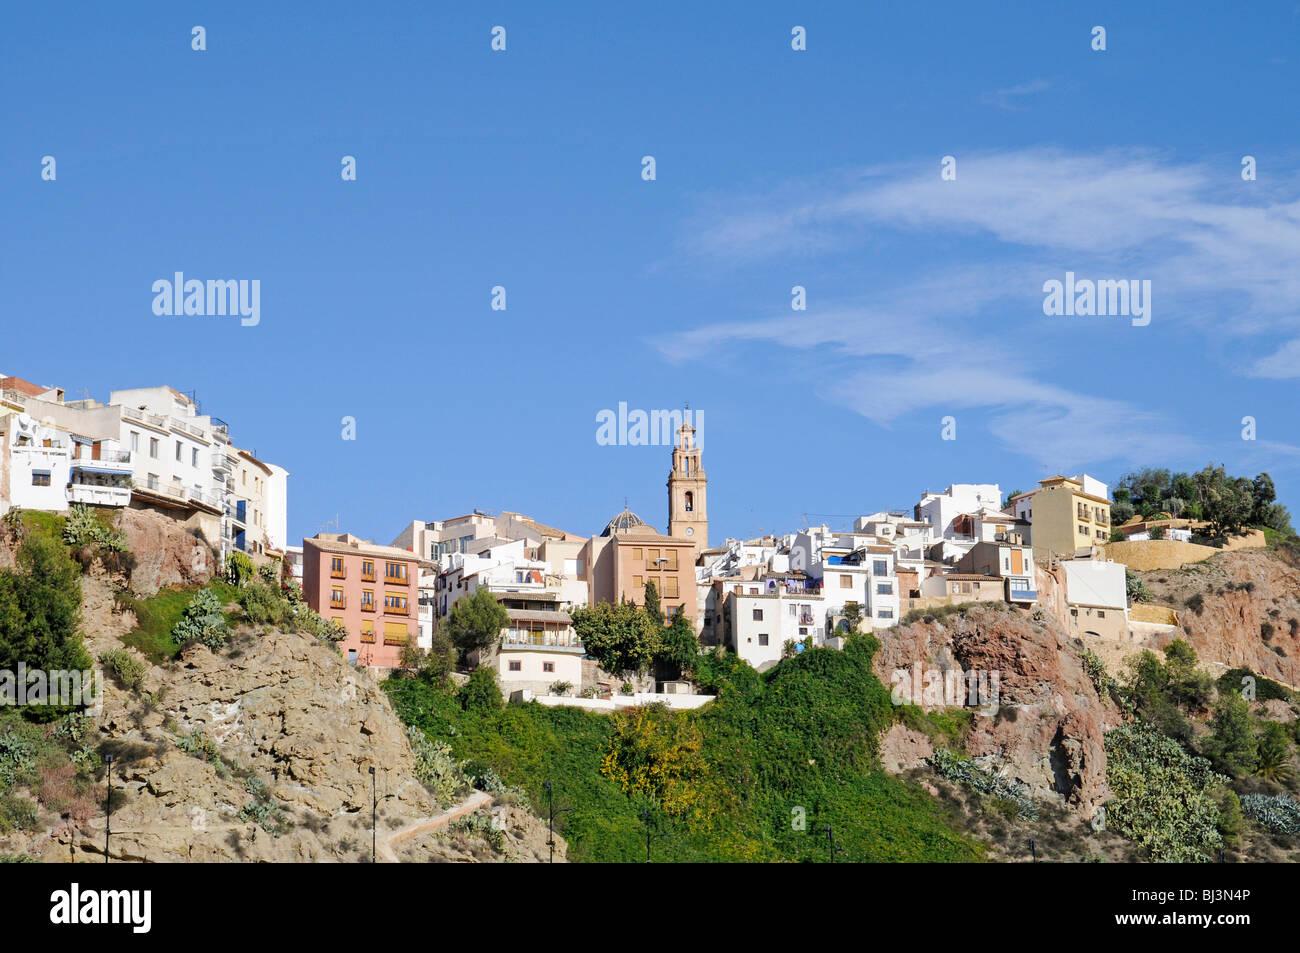 Houses, churches, steep, mountain village, Finestrat, Costa Blanca, Alicante province, Spain, Europe - Stock Image